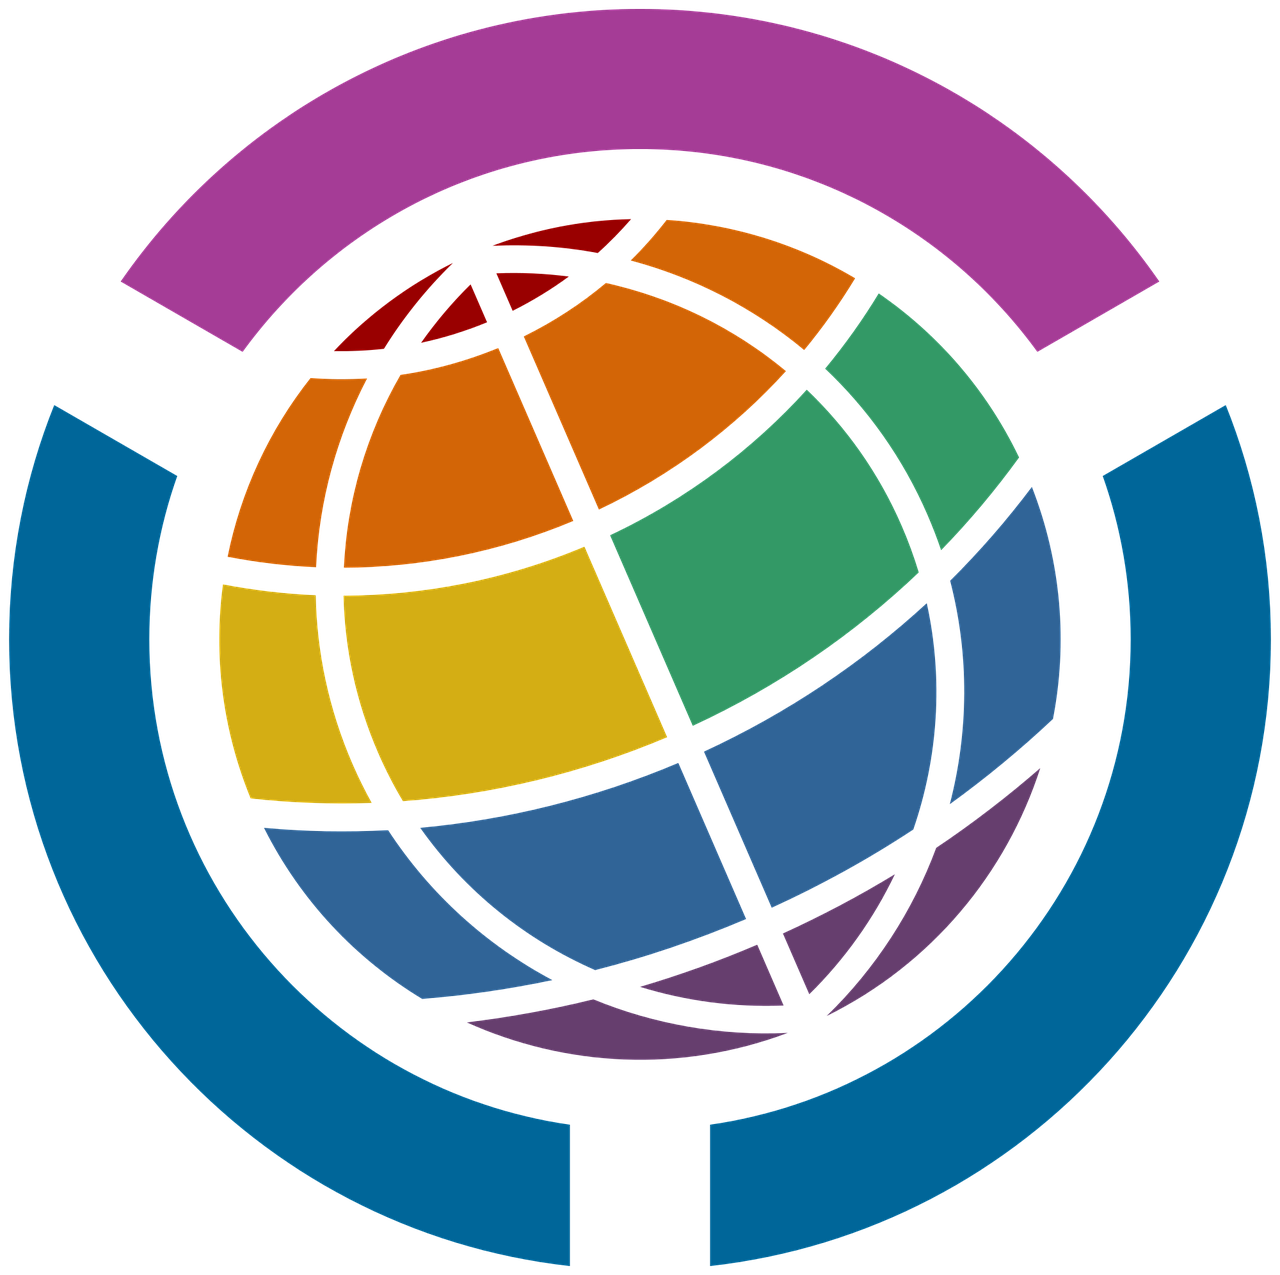 wikimedia community logo lgbt, support, symbol-1192365.jpg